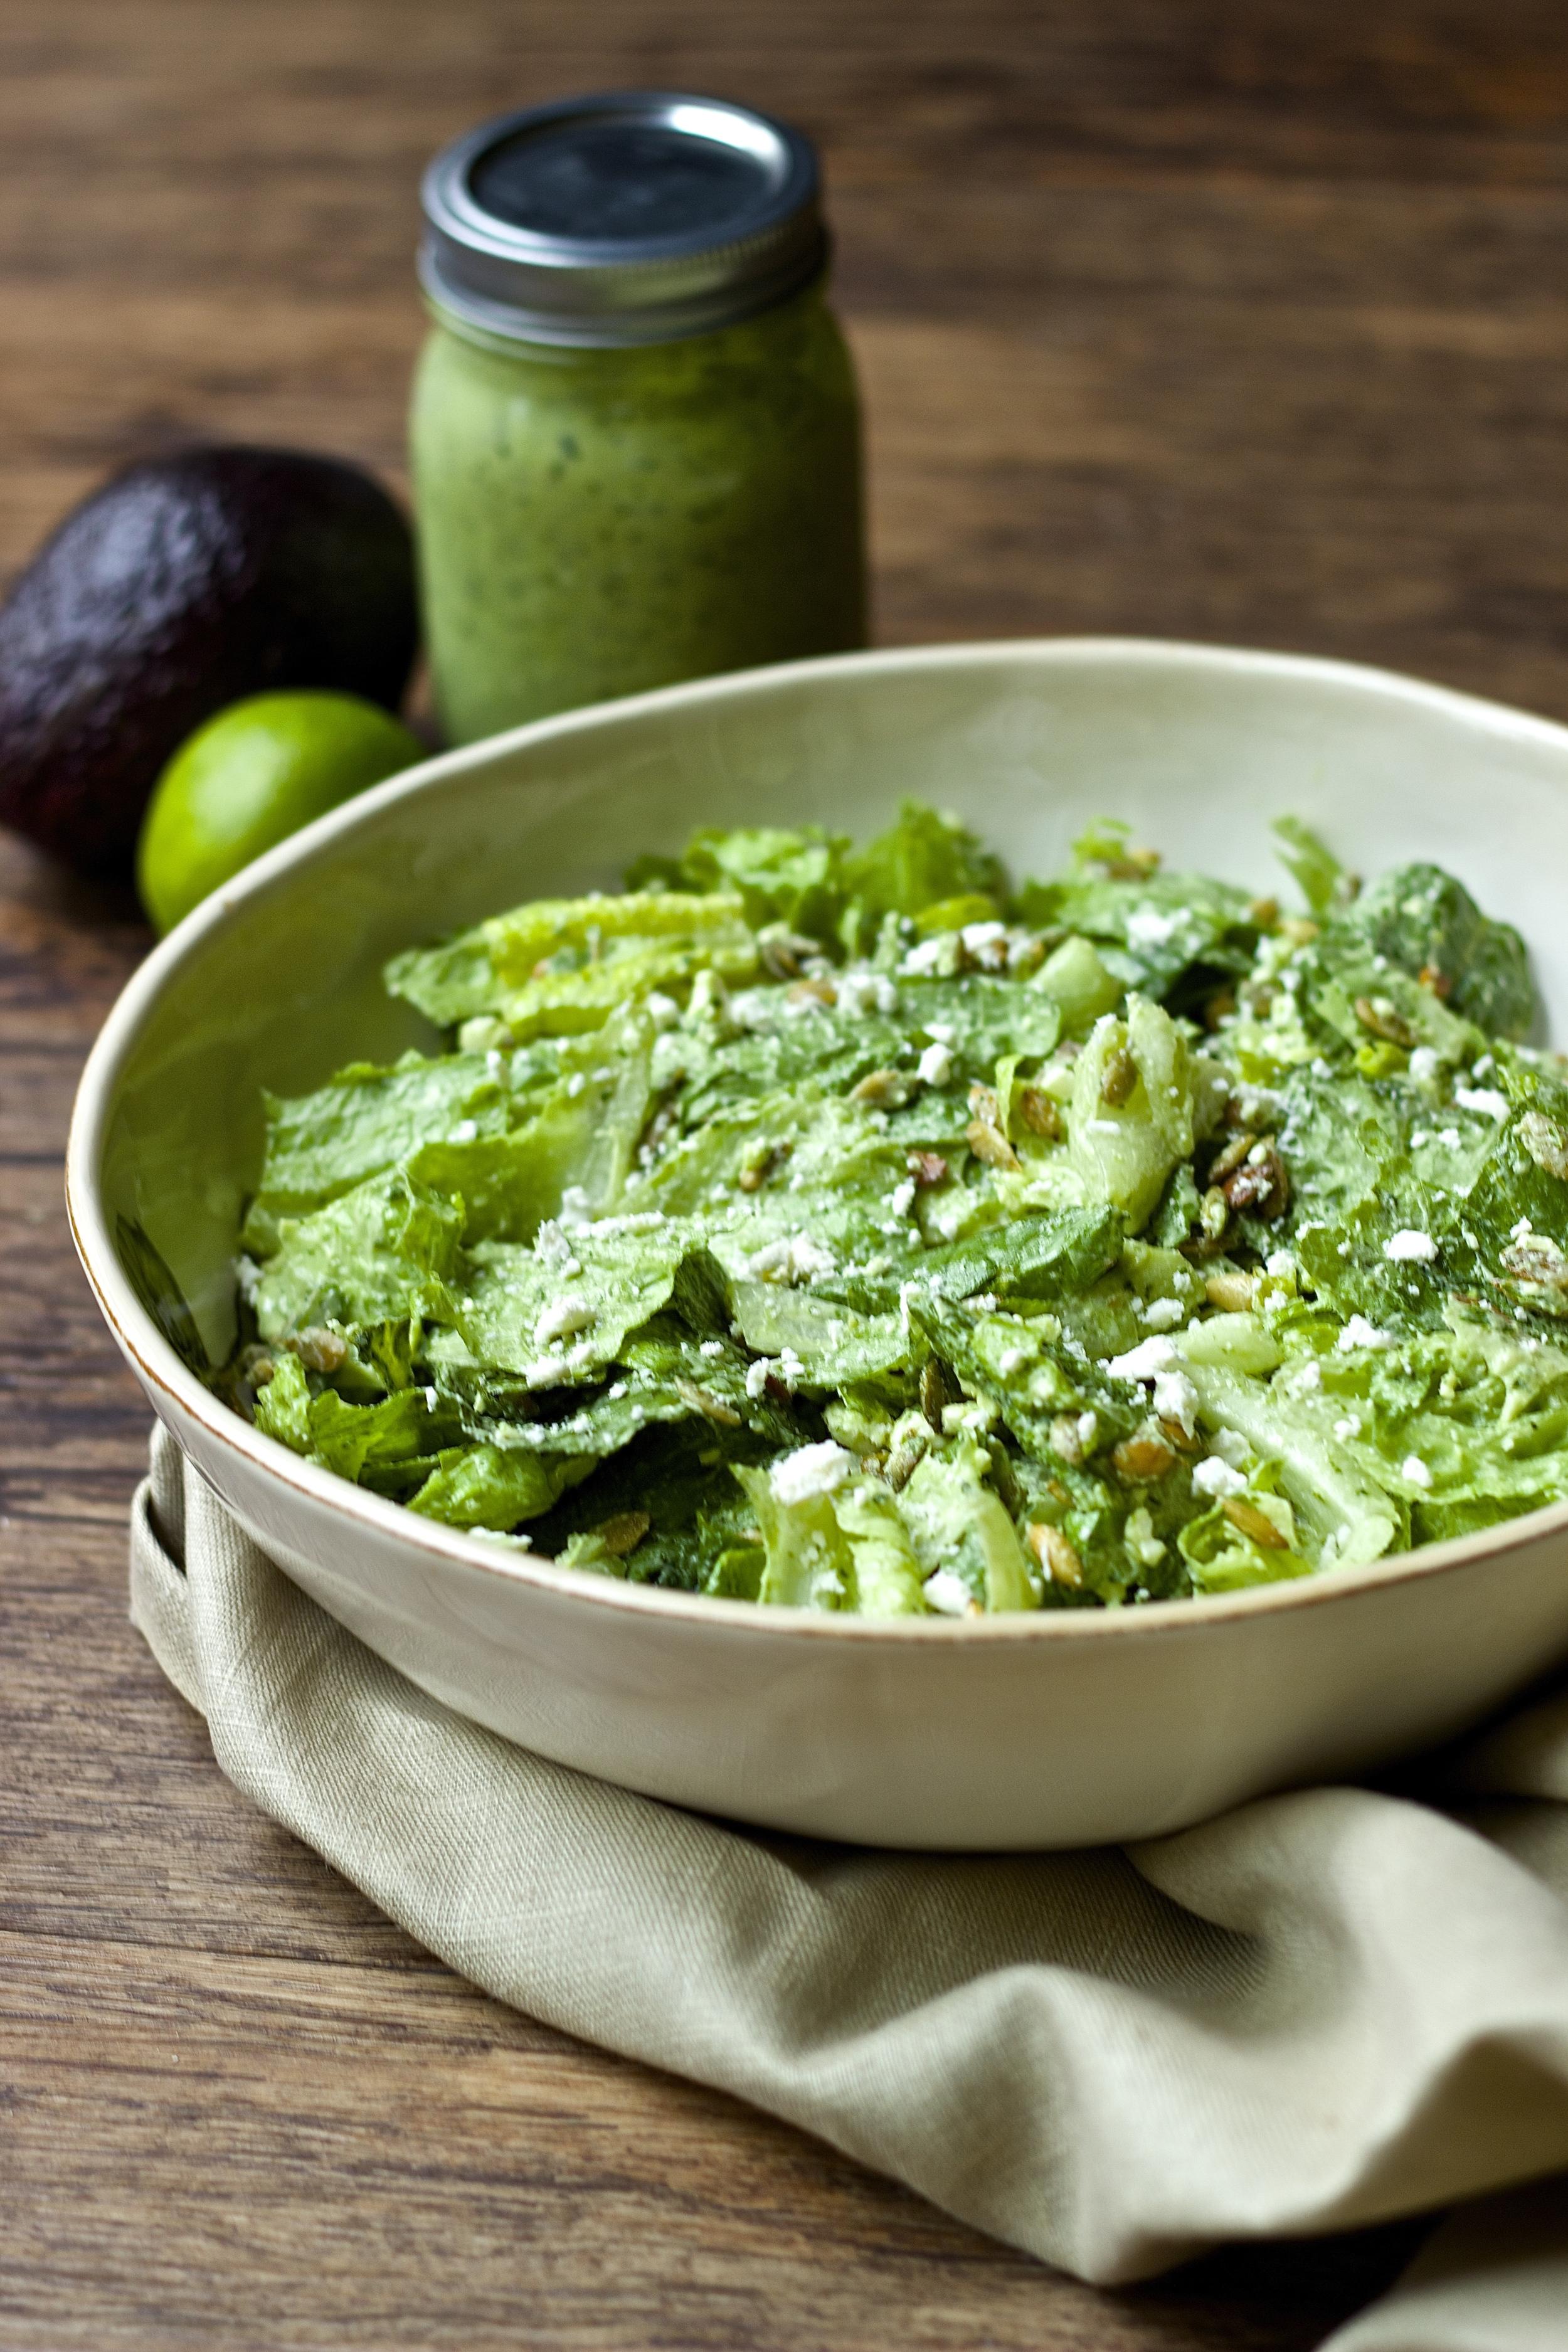 Simple Romaine Salad with Creamy Avocado Dressing, Toasted Pepitas & Feta | Kneading Home